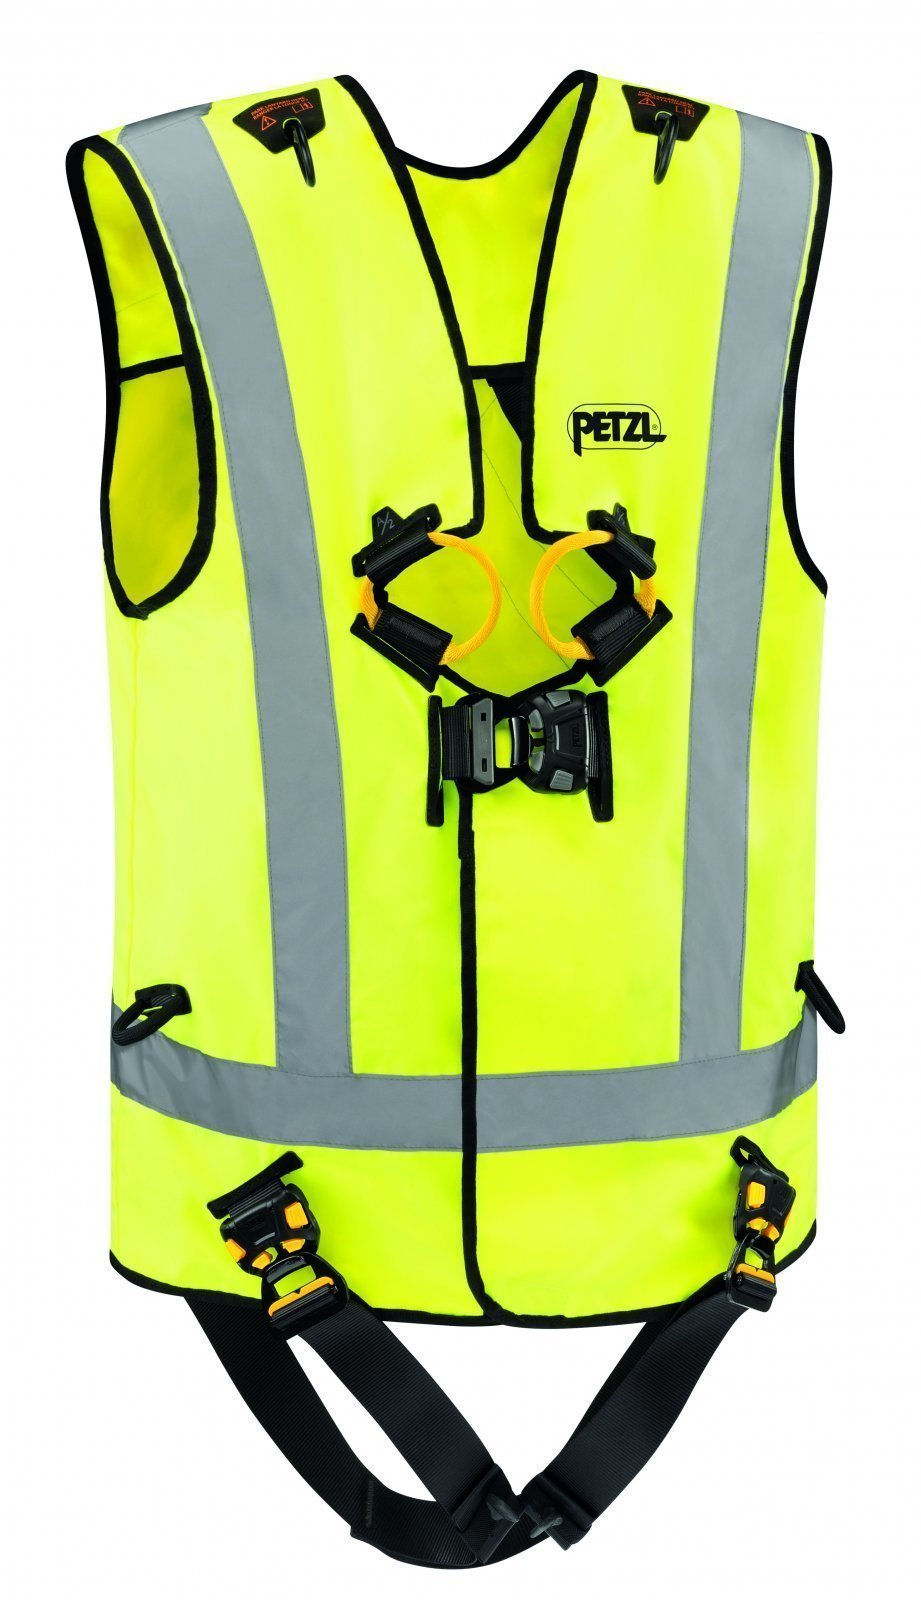 Petzl NEWTON EASYFIT HI-VIZ Fall Arrest Harness With High-Visibility Vest, ANSI & CSA